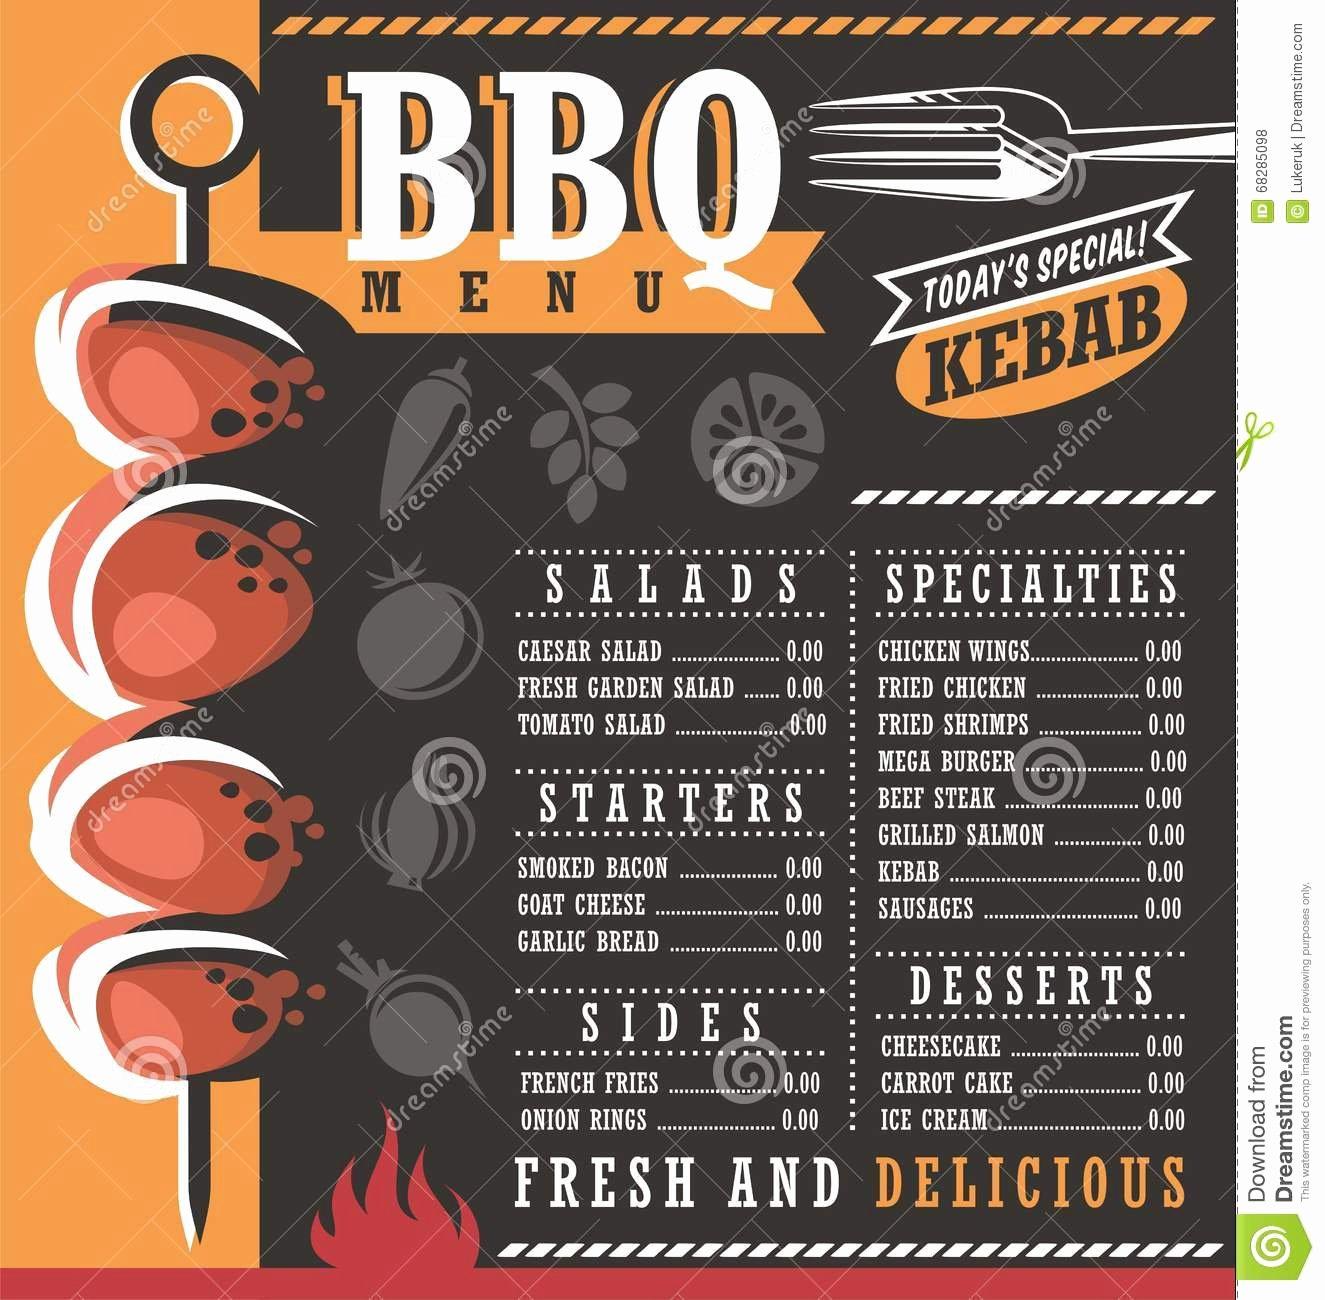 Bbq Catering Menu Template New Bbq Restaurant Menu Design Stock Vector Image